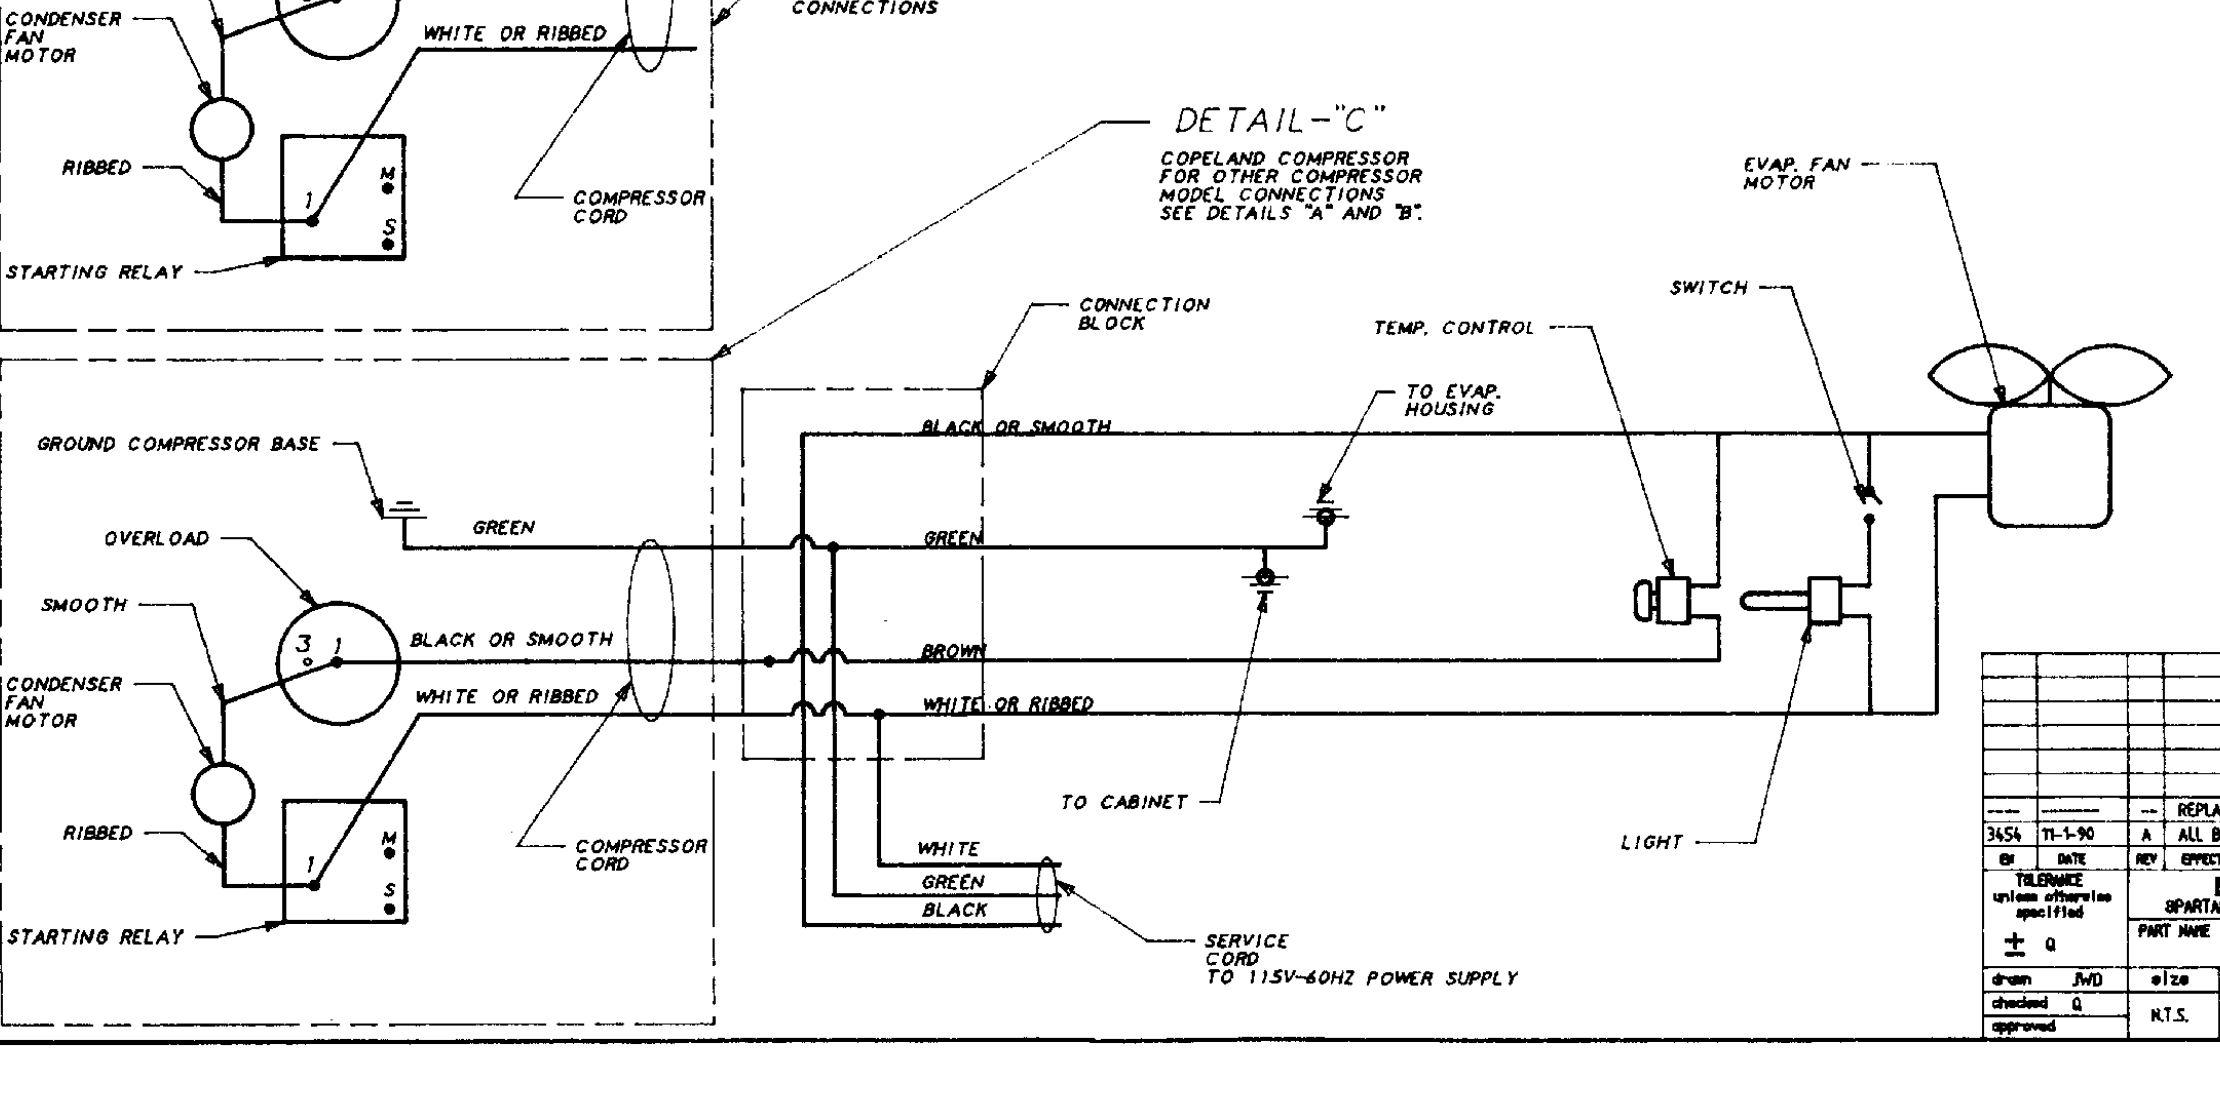 Need Help With Wiring My Fridge